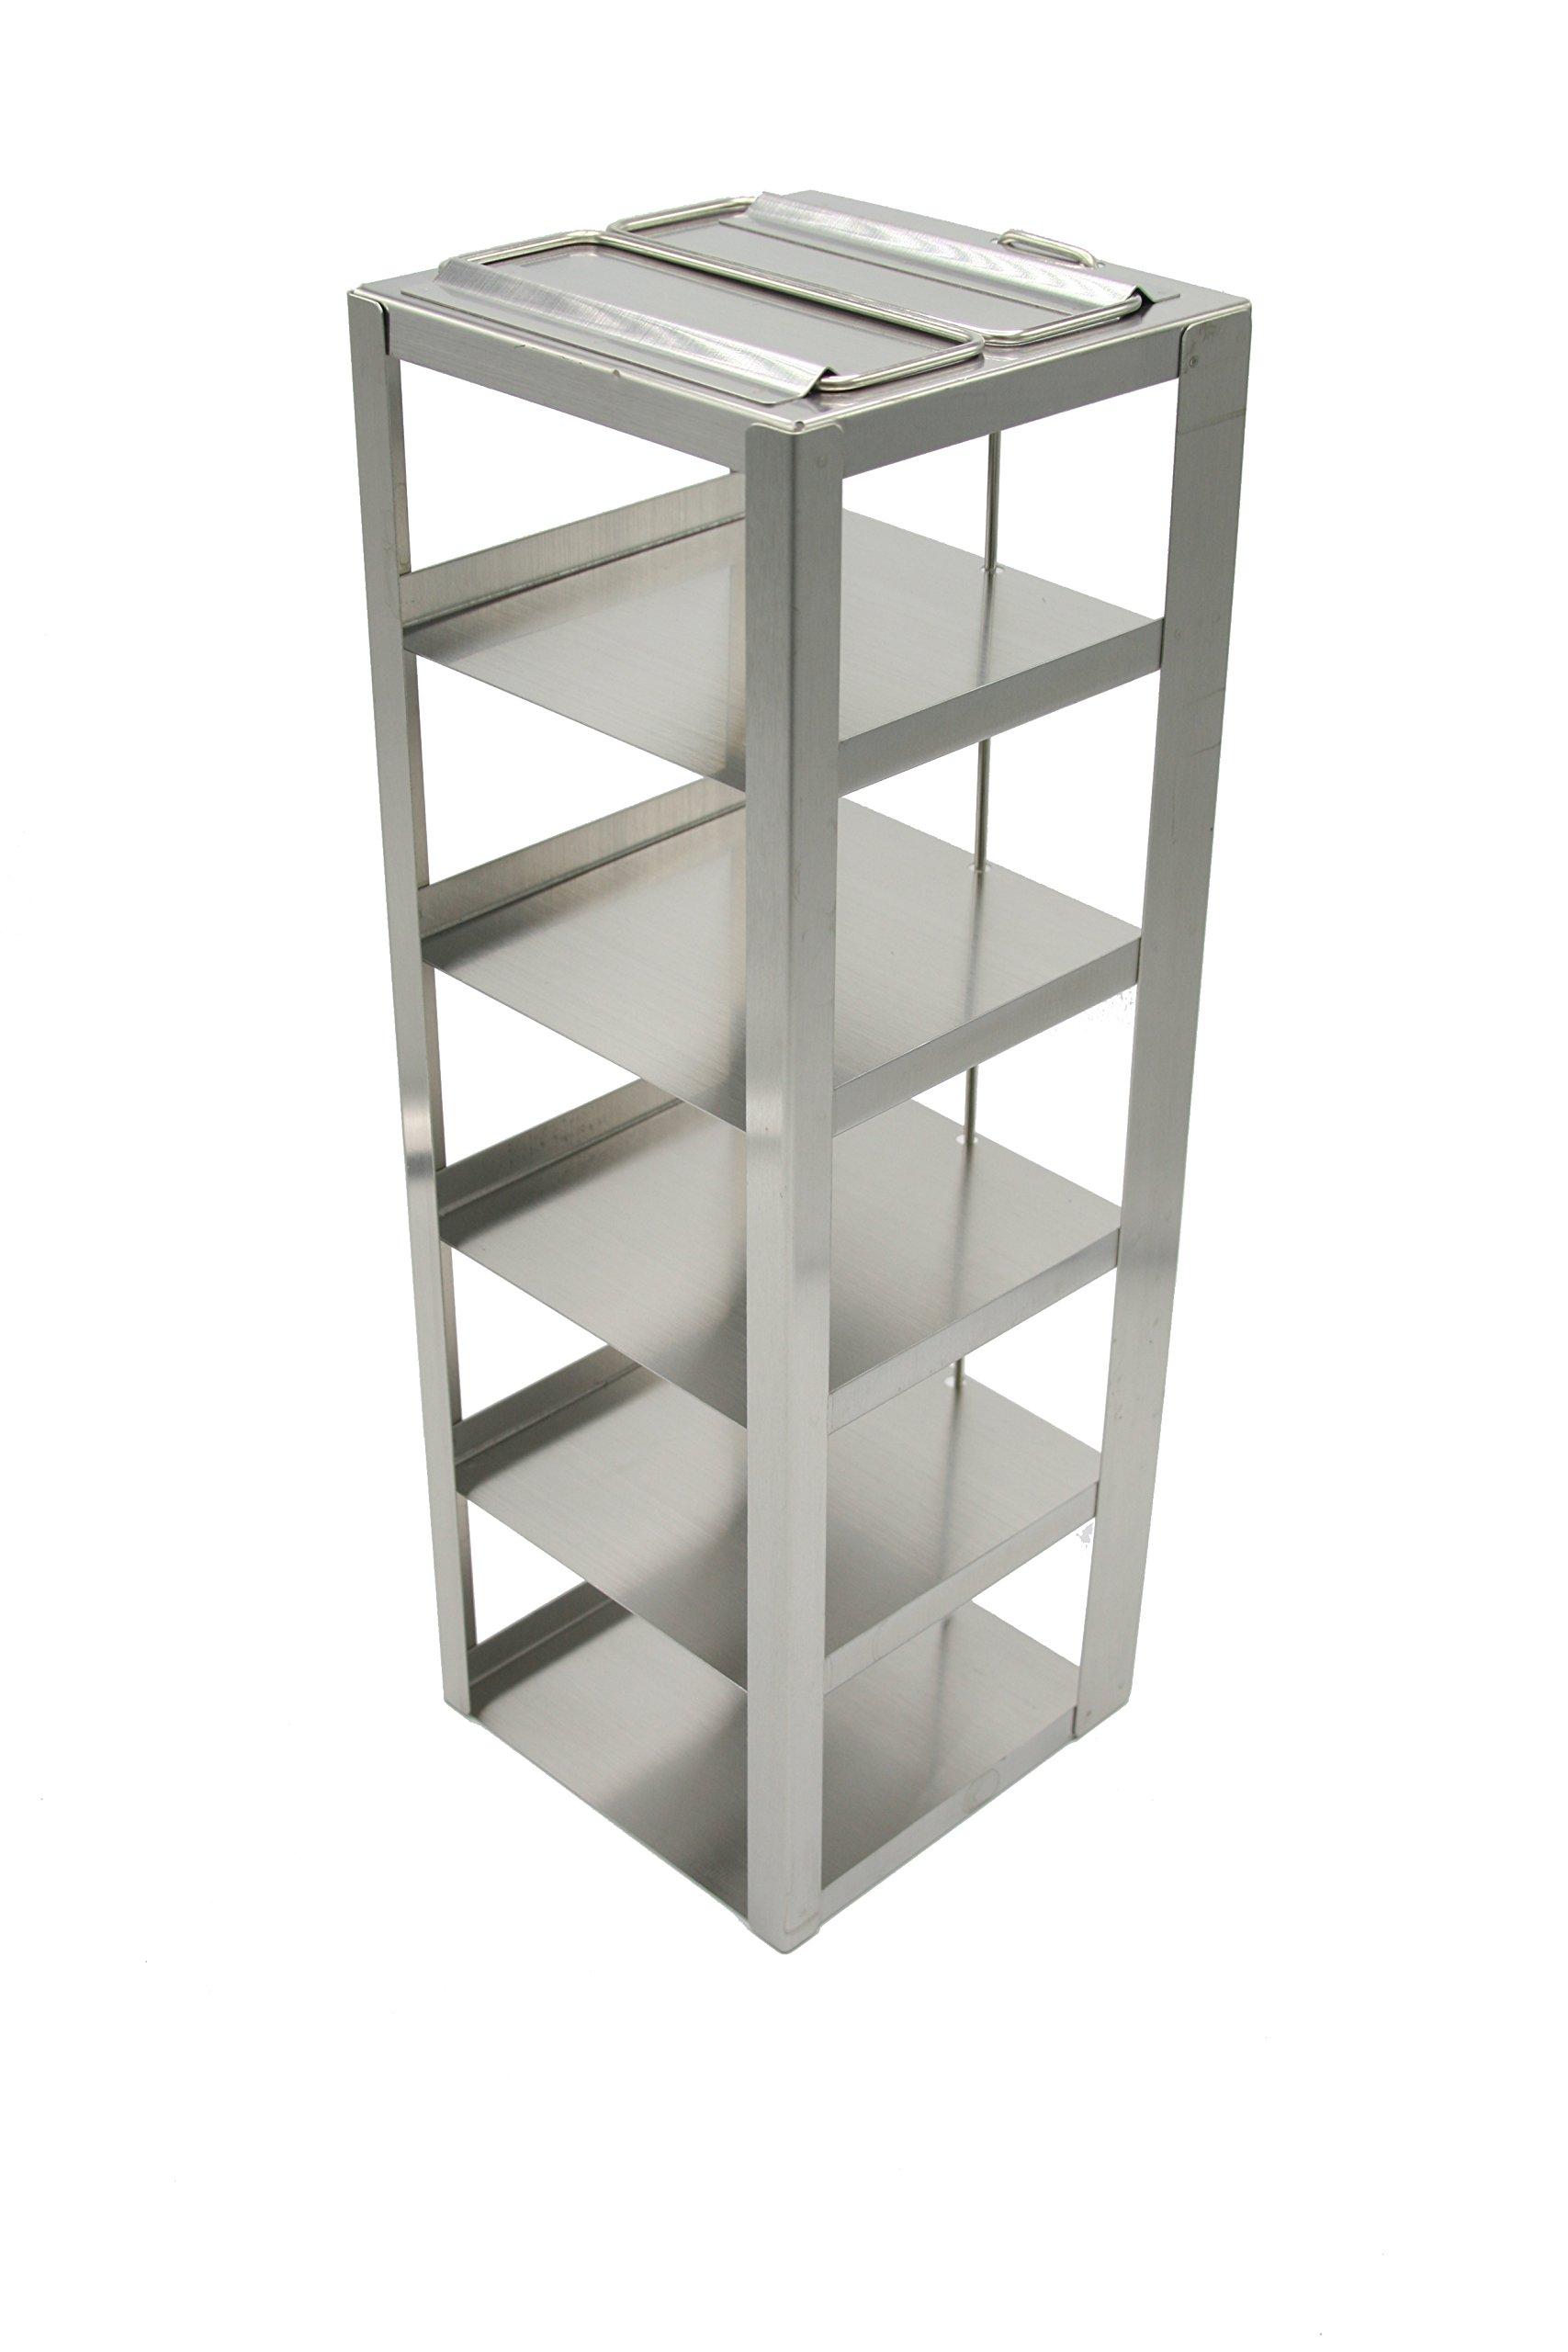 Heathrow Scientific HD2862DA Steel Standard Chest Freezer Vertical Rack with 5 Shelves, For 3'' Box Height